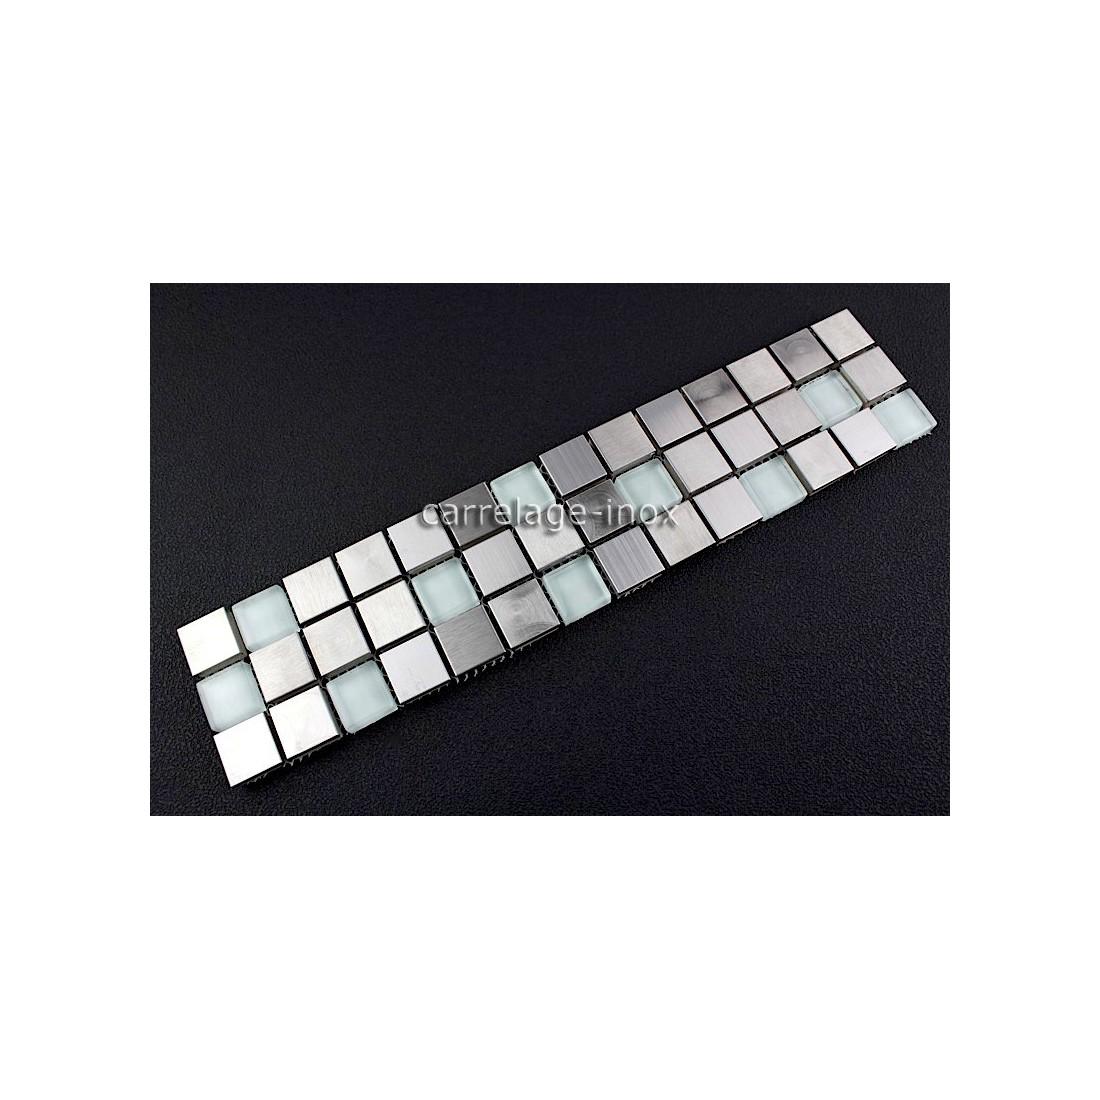 listel inox mosaique carrelage frise acier metal multi regular. Black Bedroom Furniture Sets. Home Design Ideas